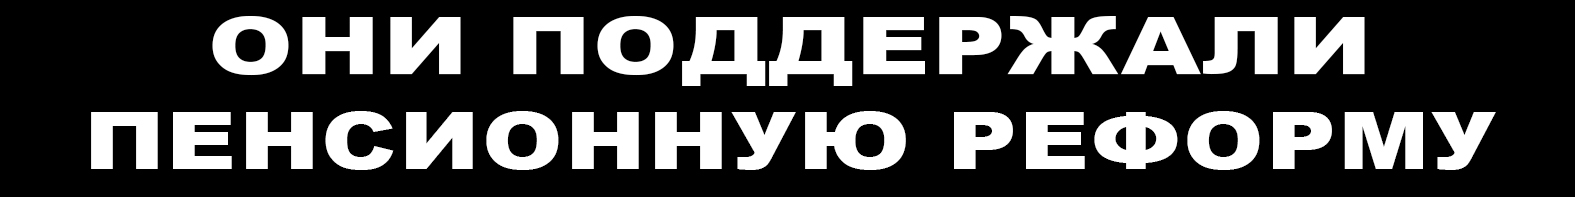 Главная — ГАГАРИН